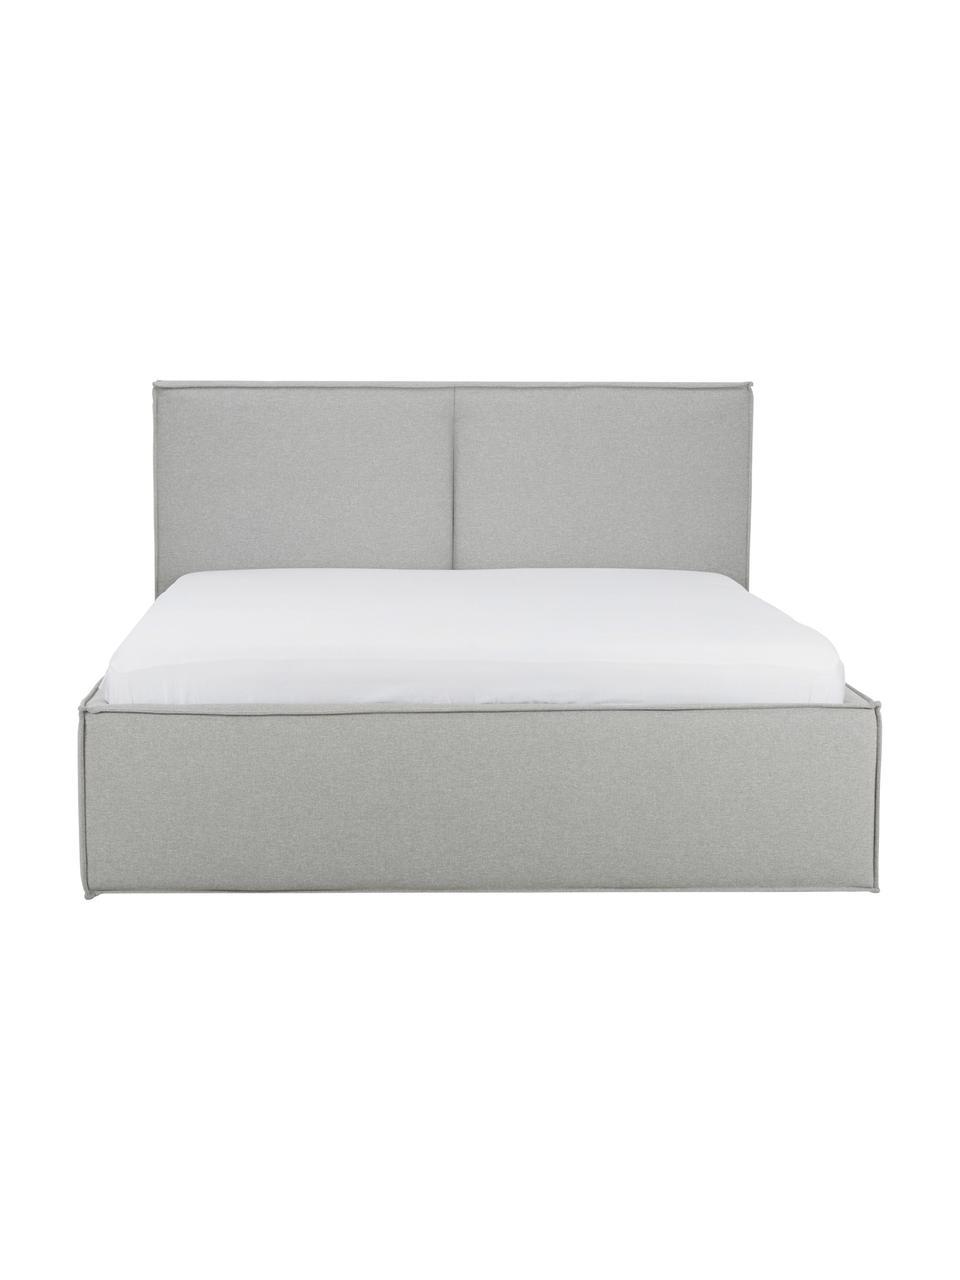 Gestoffeerd bed Dream met opbergruimte, Frame: massief grenenhout, Bekleding: polyester (structuurmater, Donkergrijs, 180 x 200 cm